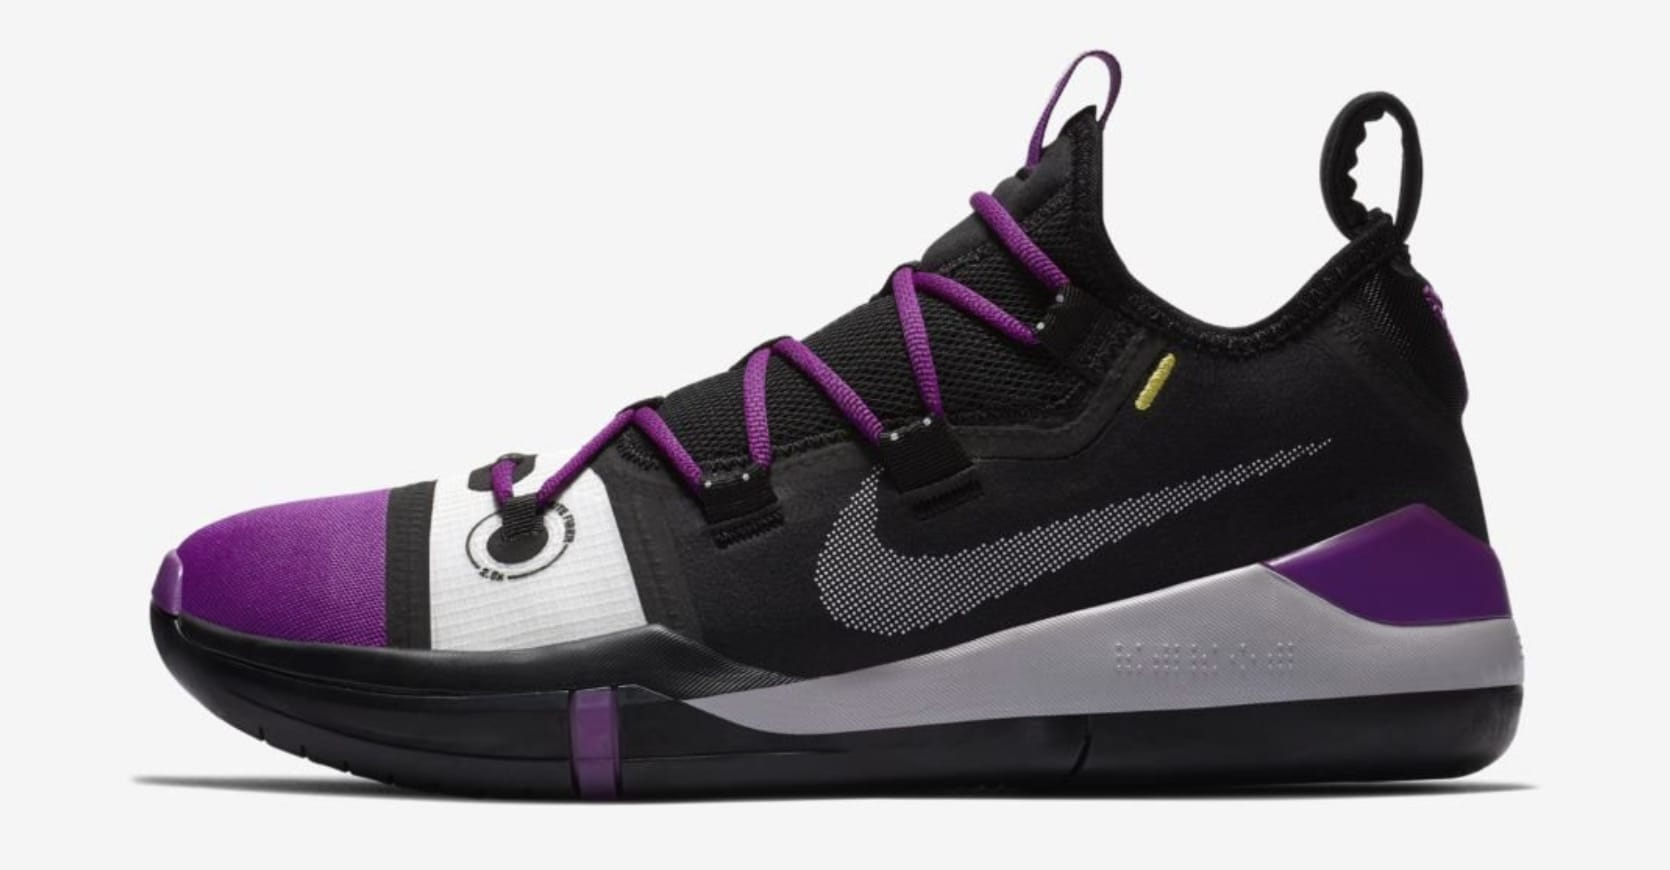 White And Purple Nike Basketball Shoes